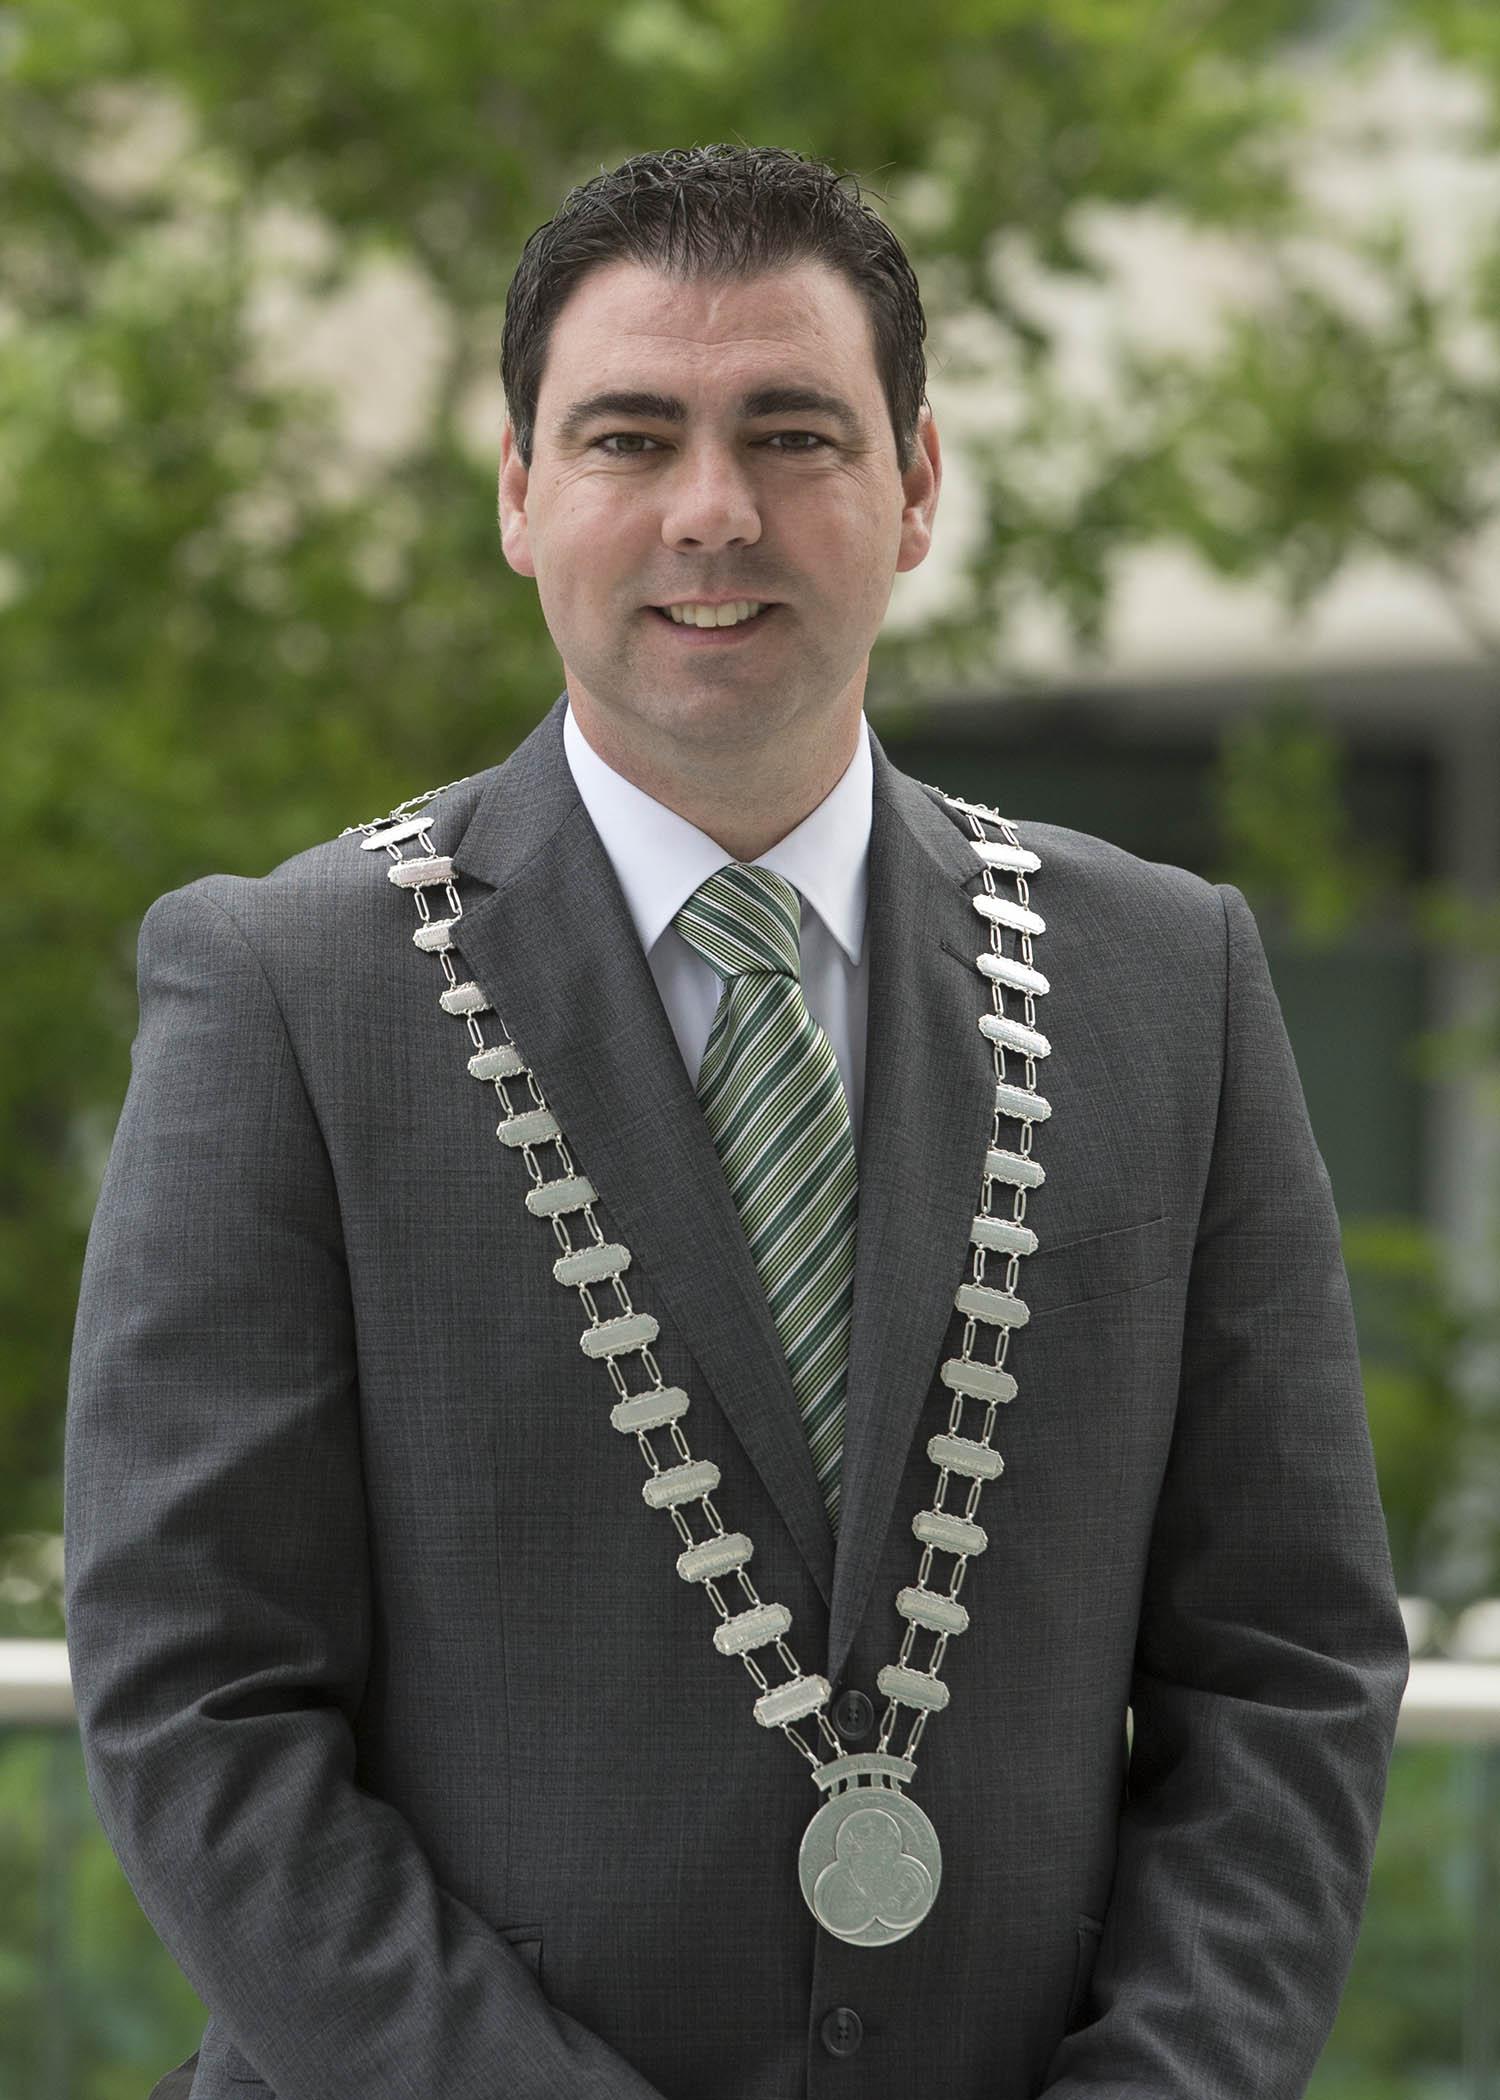 Cork County Mayor visits China on trade mission